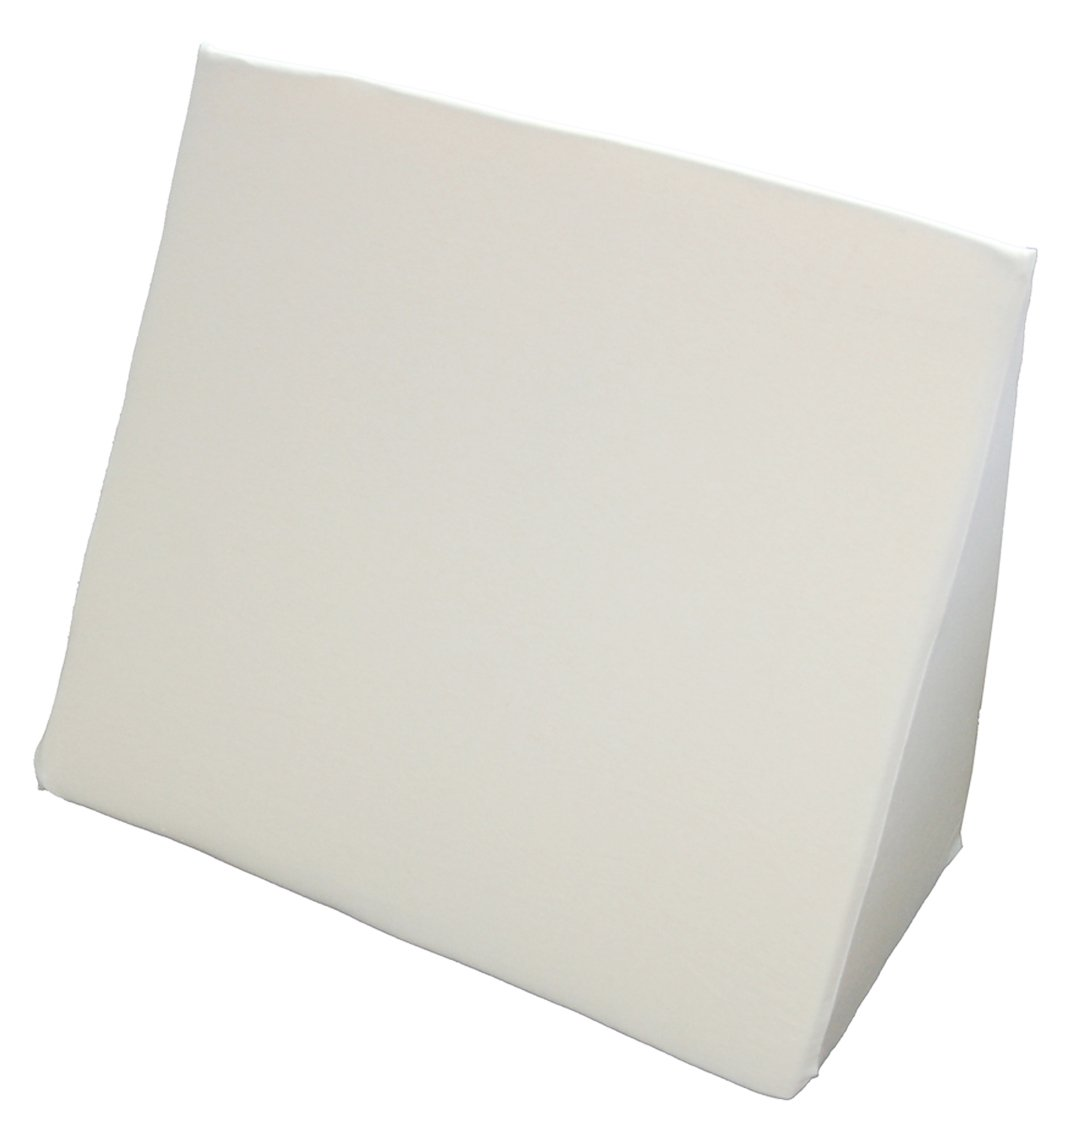 Beties Big Comfy Q1 Keilkissen extra groß + Baumwoll Jersey Bezug ca. 62x49x30 cm in vielen bunten Farben (Weiß)